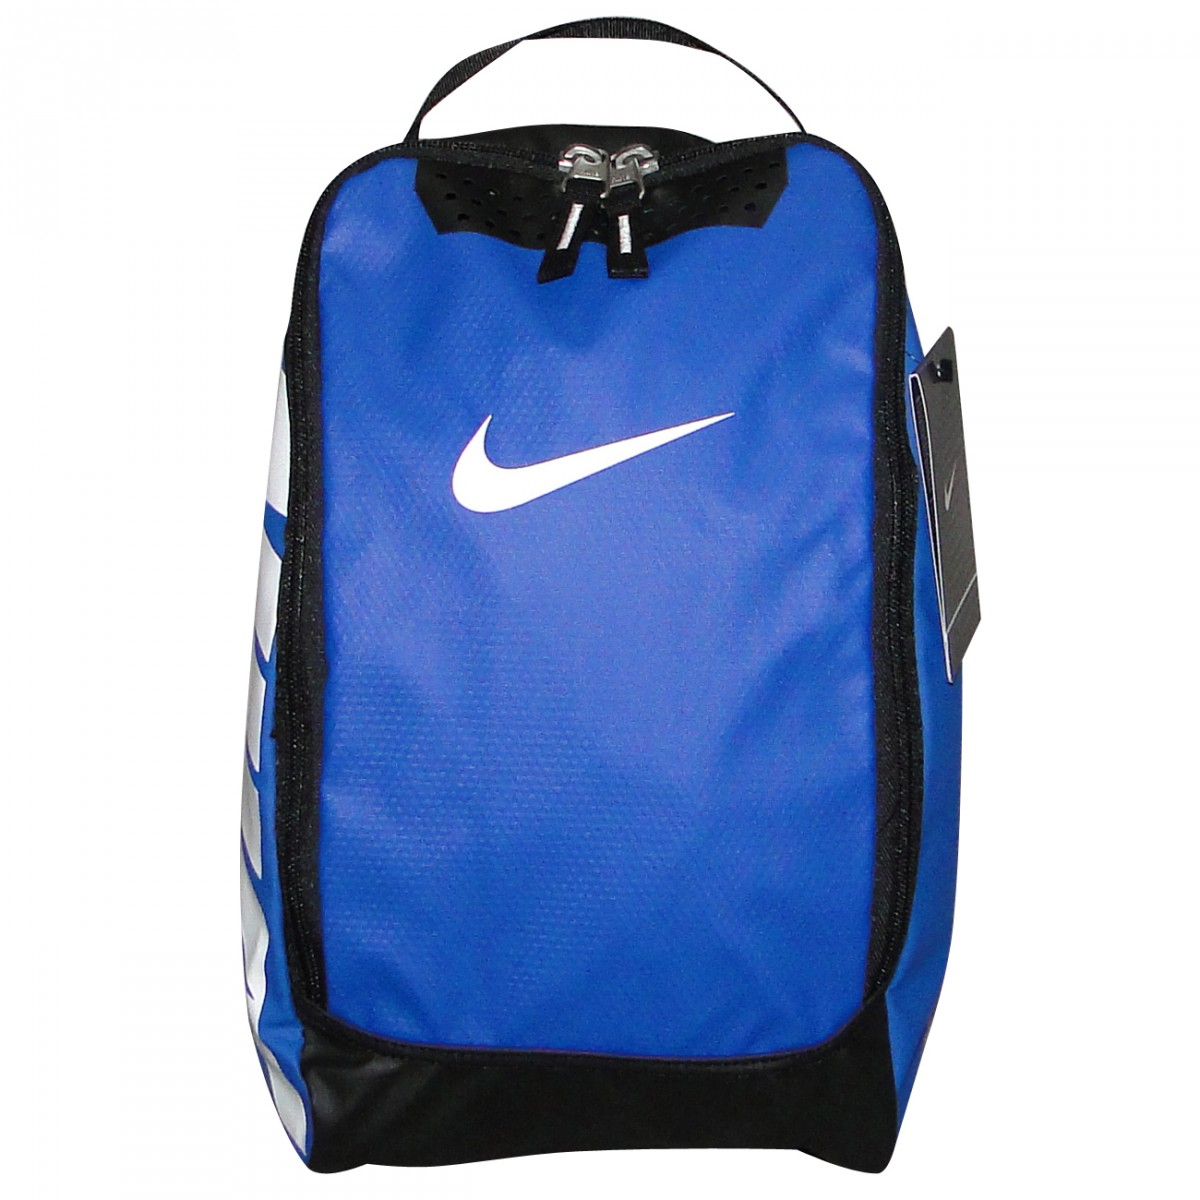 Porta Chuteira Nike Ref.Ba4600 BA4600-041 - Azul Branco - Chuteira ... a828d0661fc69